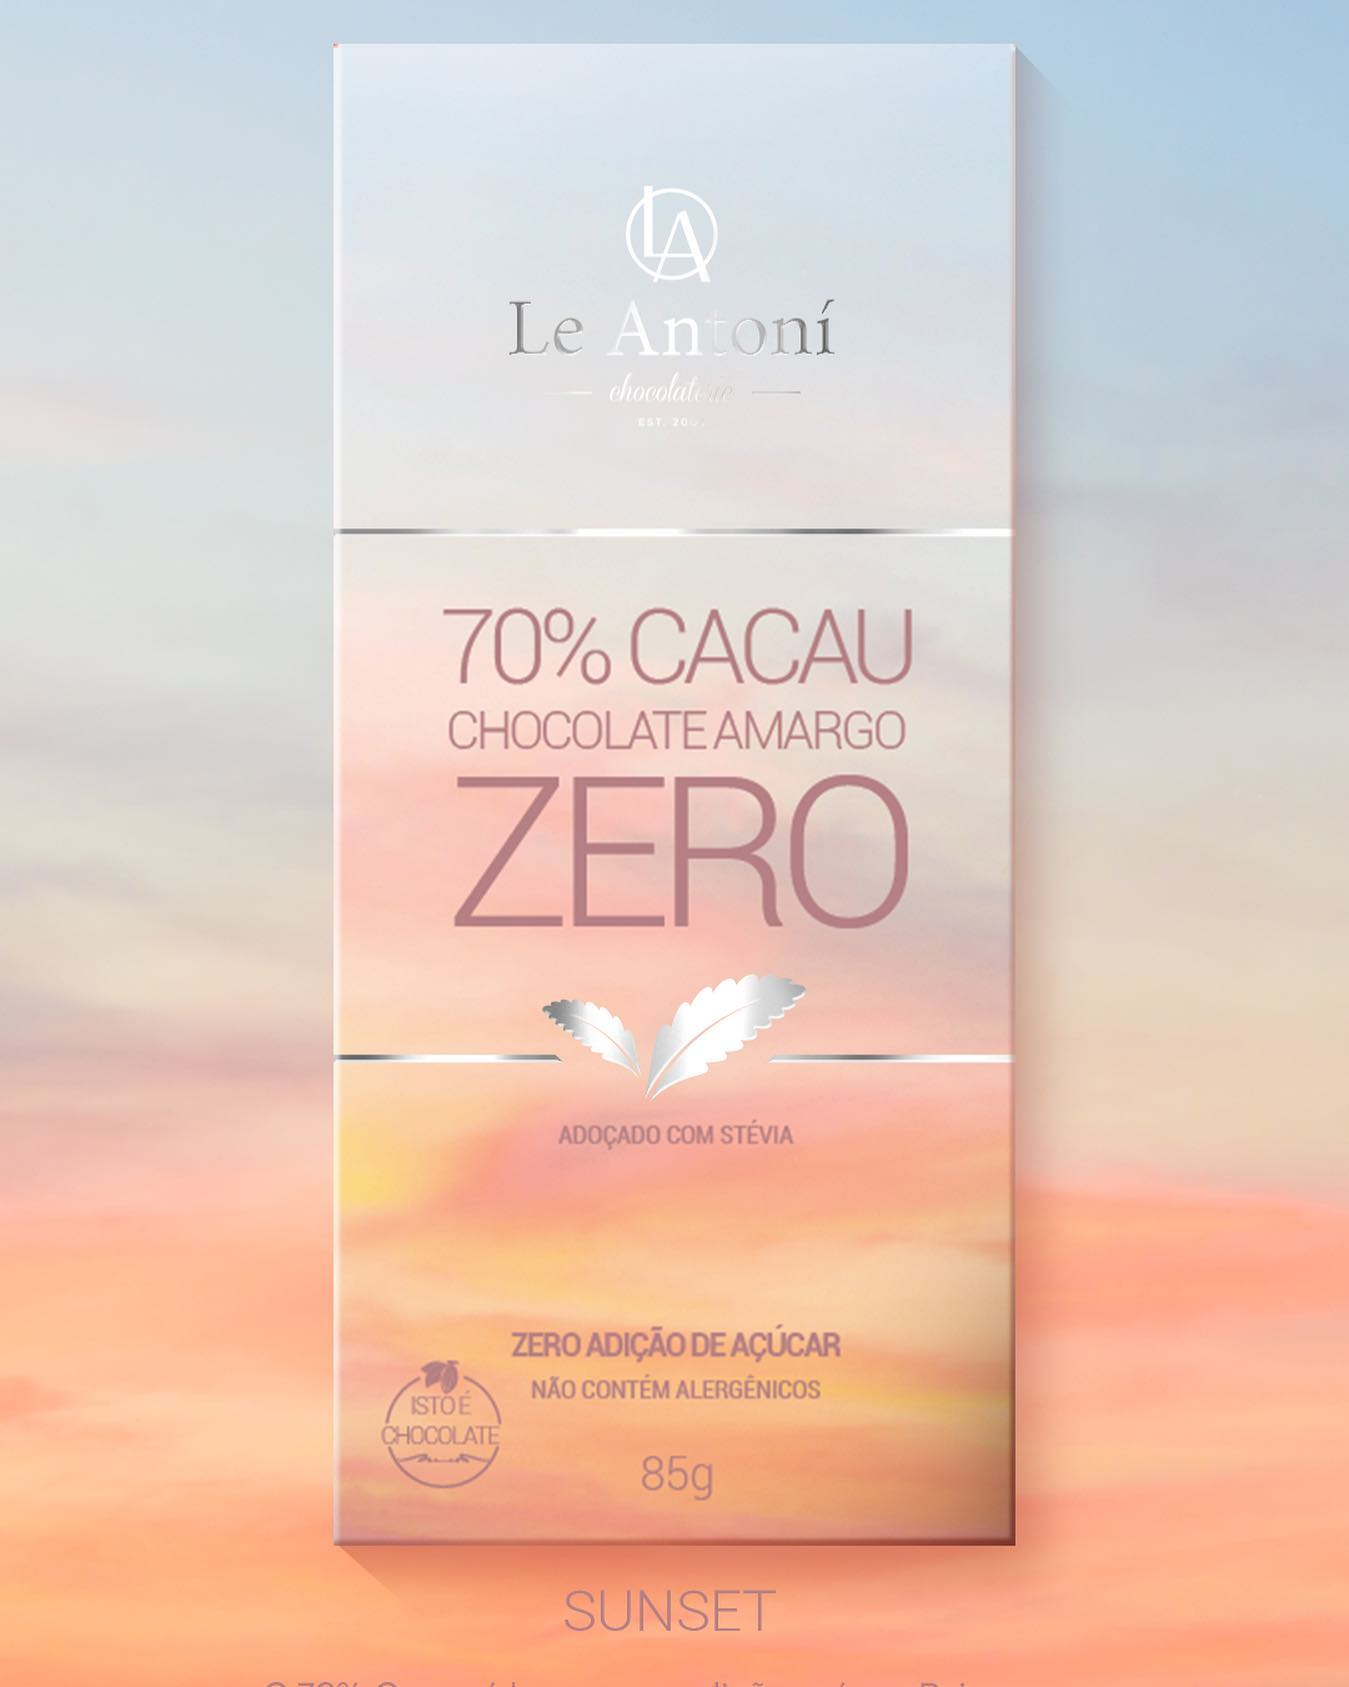 LA ANTONI Chocolate 70% Cacau ZERO ACÚCAR  - 85g